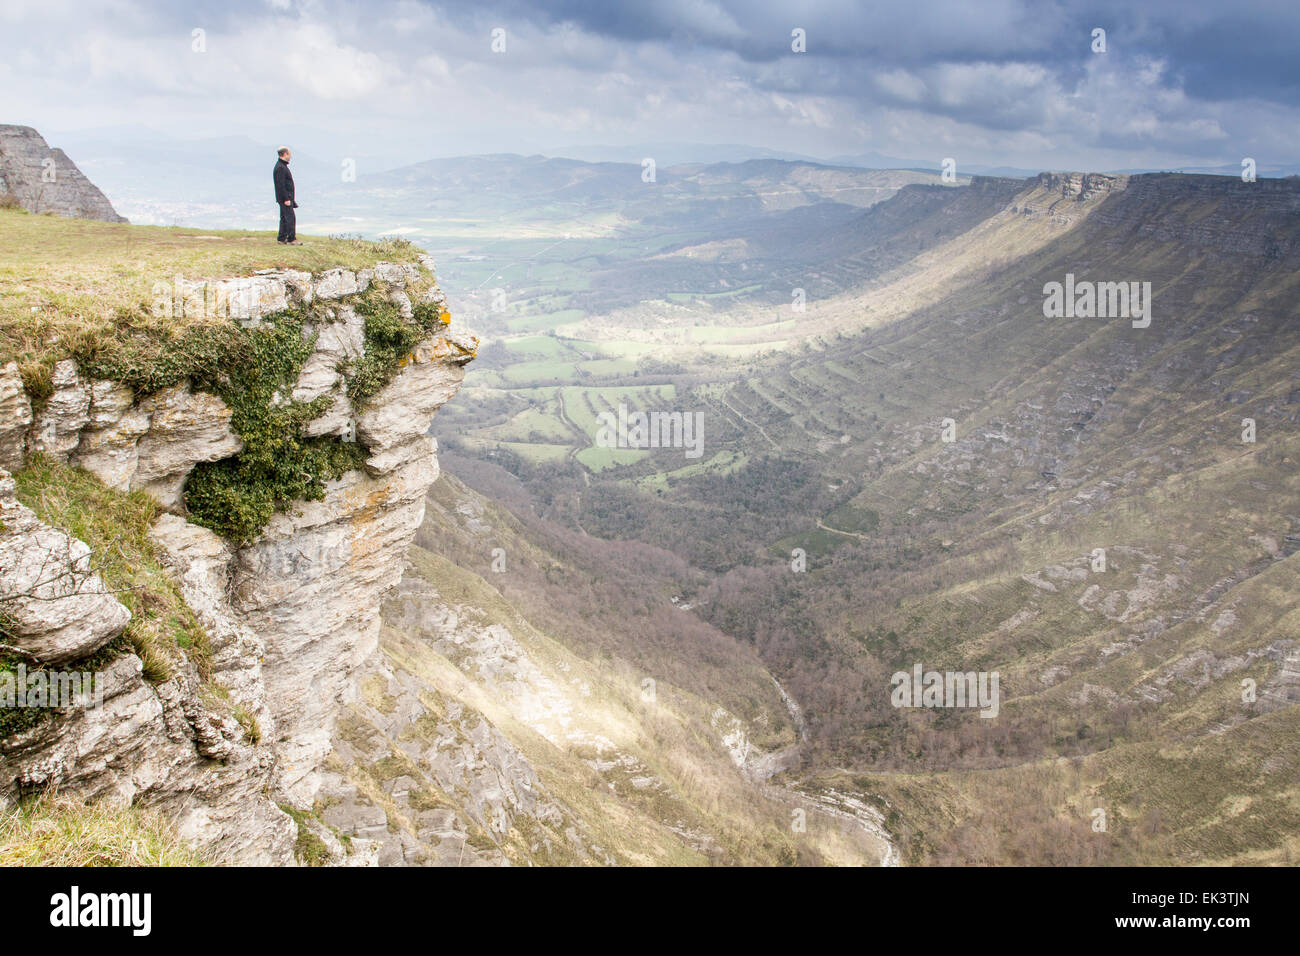 Nervion Canyon im Delika, Araba, Baskenland Stockfoto